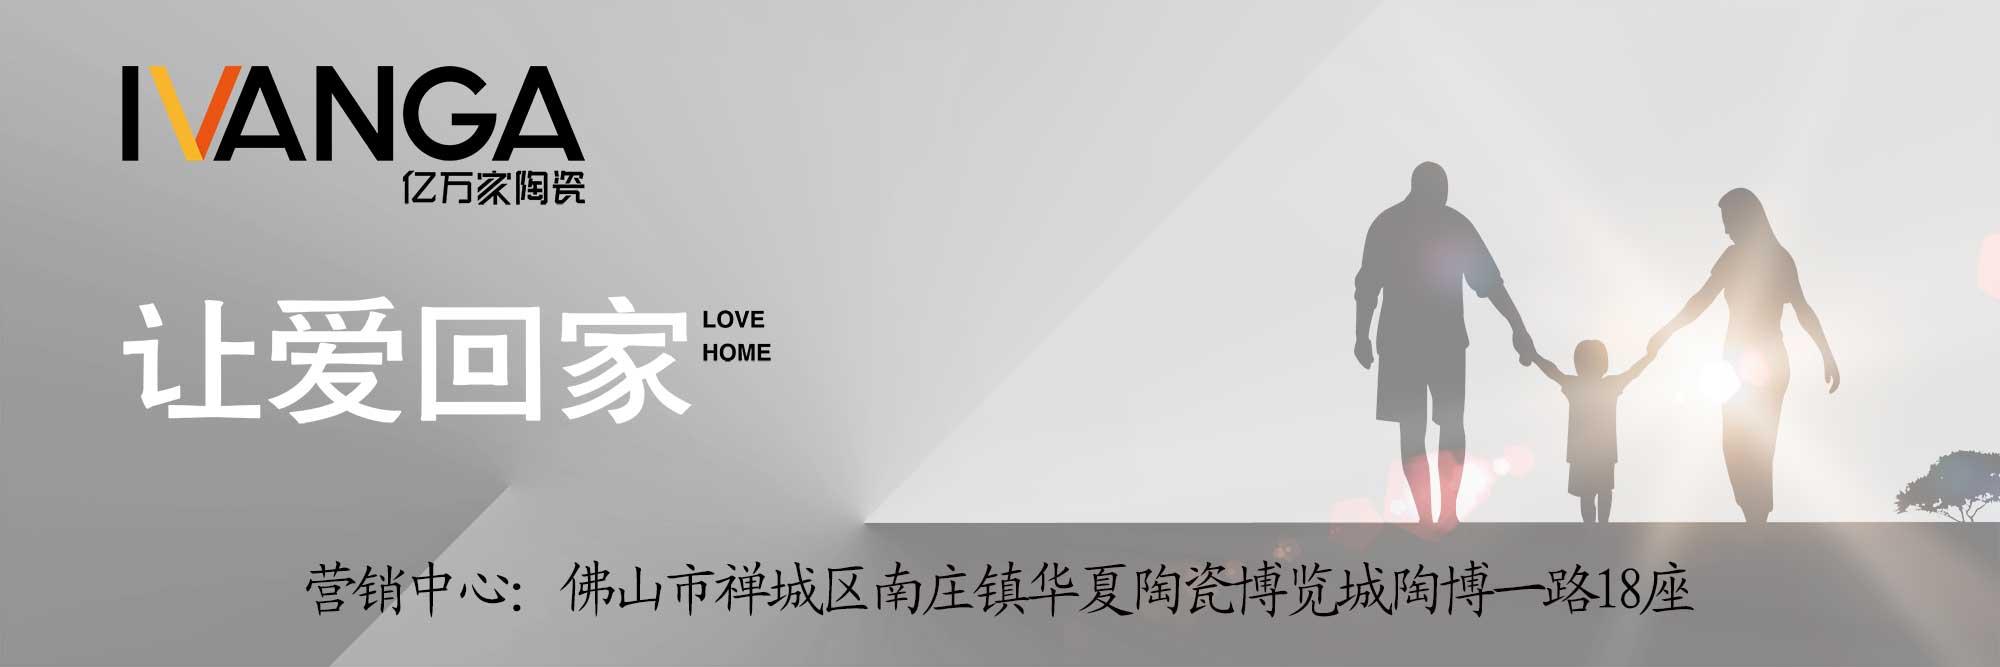 TA是亿万家庭最信赖的瓷砖品牌